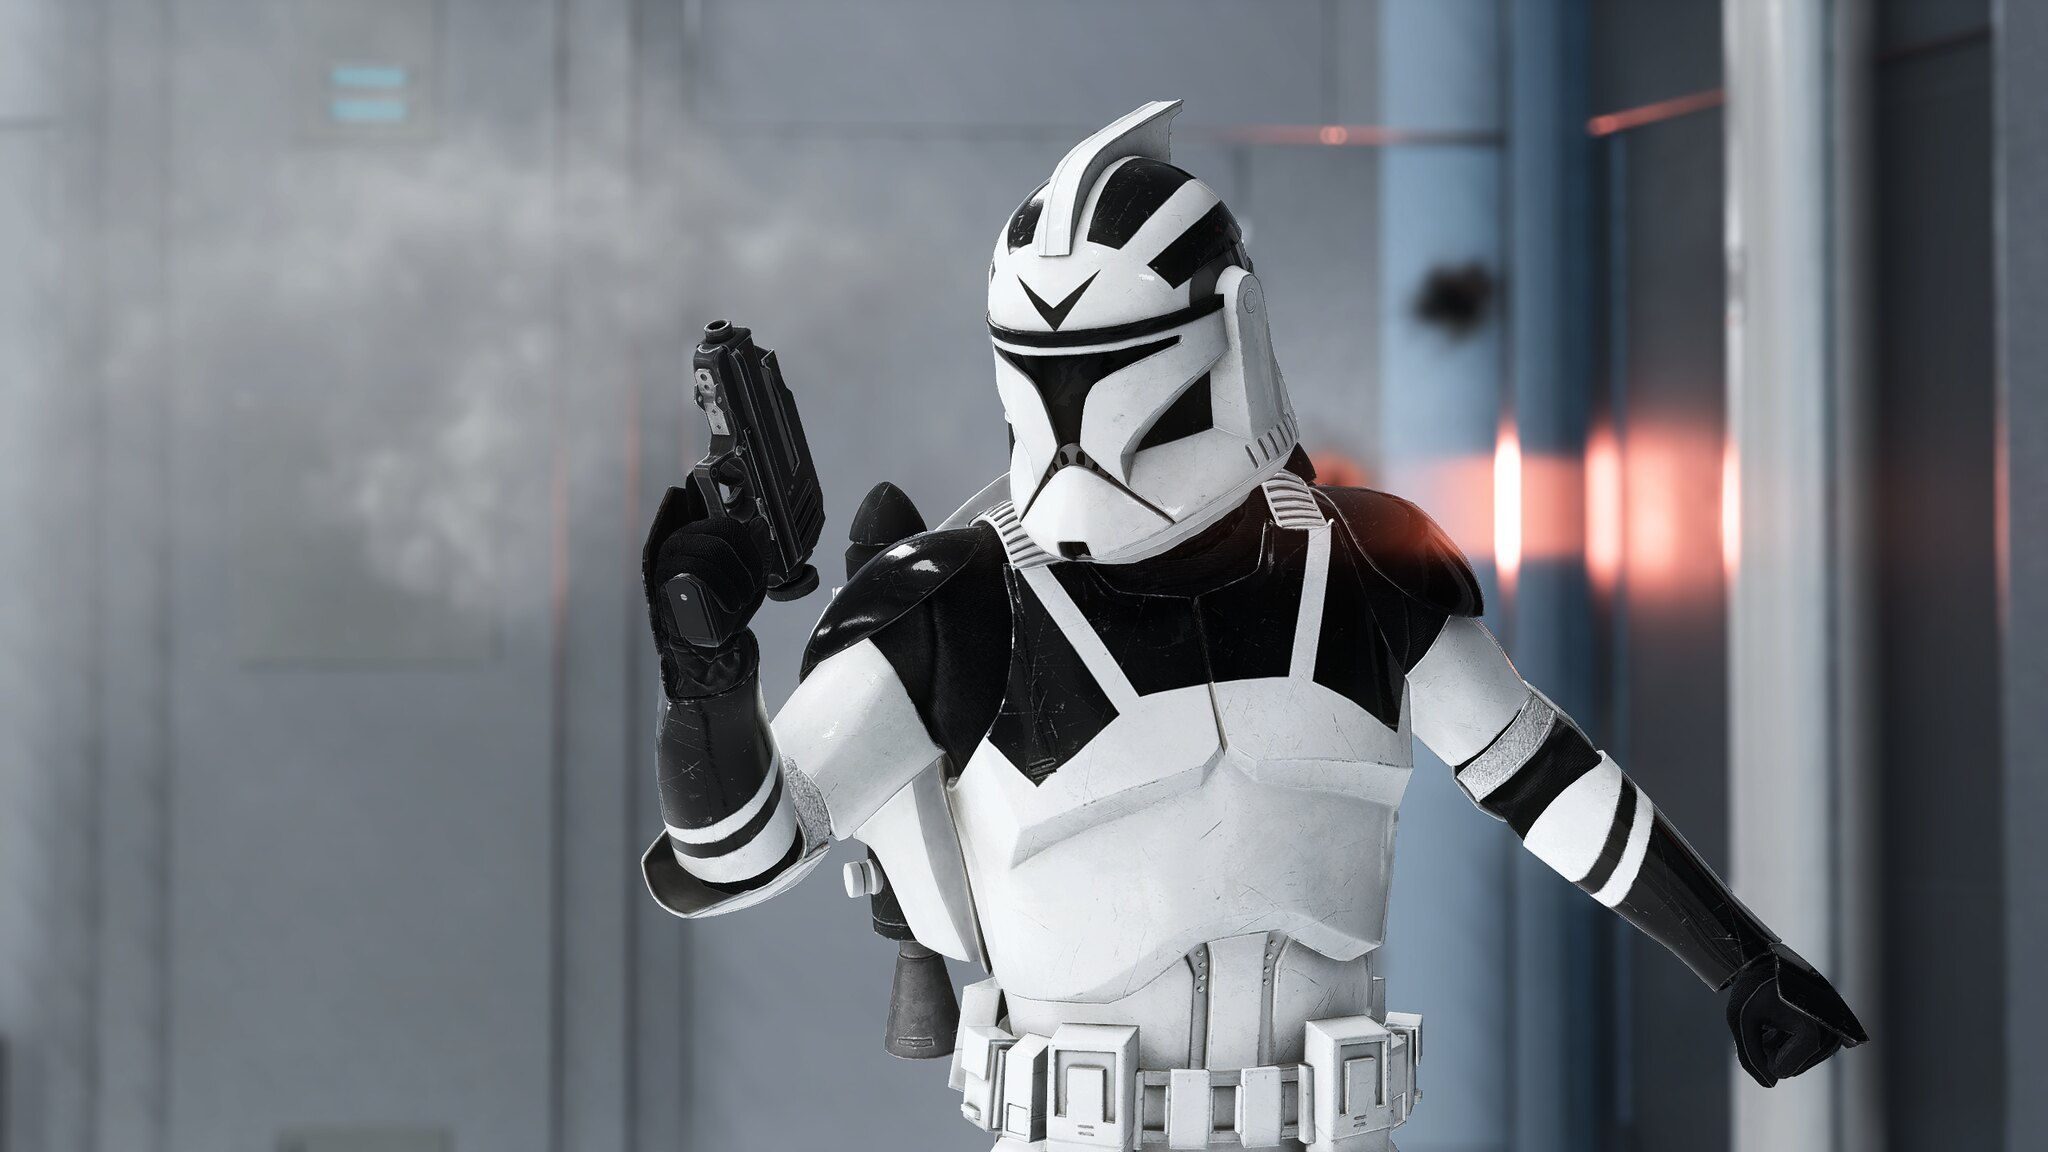 38680227952_662eb84cc6_k.jpg - Star Wars: Battlefront 2 (2017)